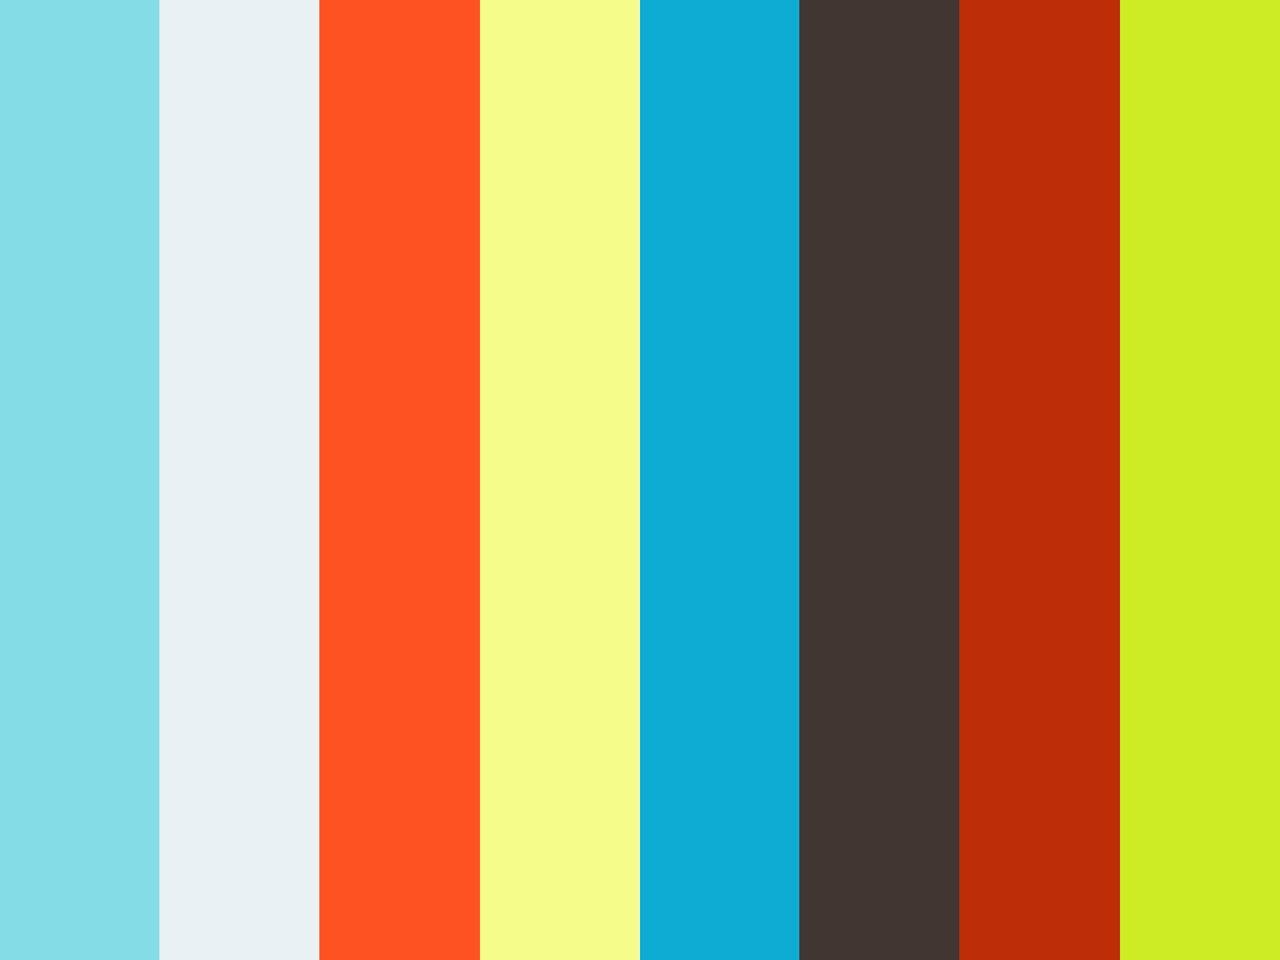 #ThatsHowIBURNITUP Janet Jackson - BURNITUP! (feat. Missy Elliott) - Presented By Tobias Ellehammer